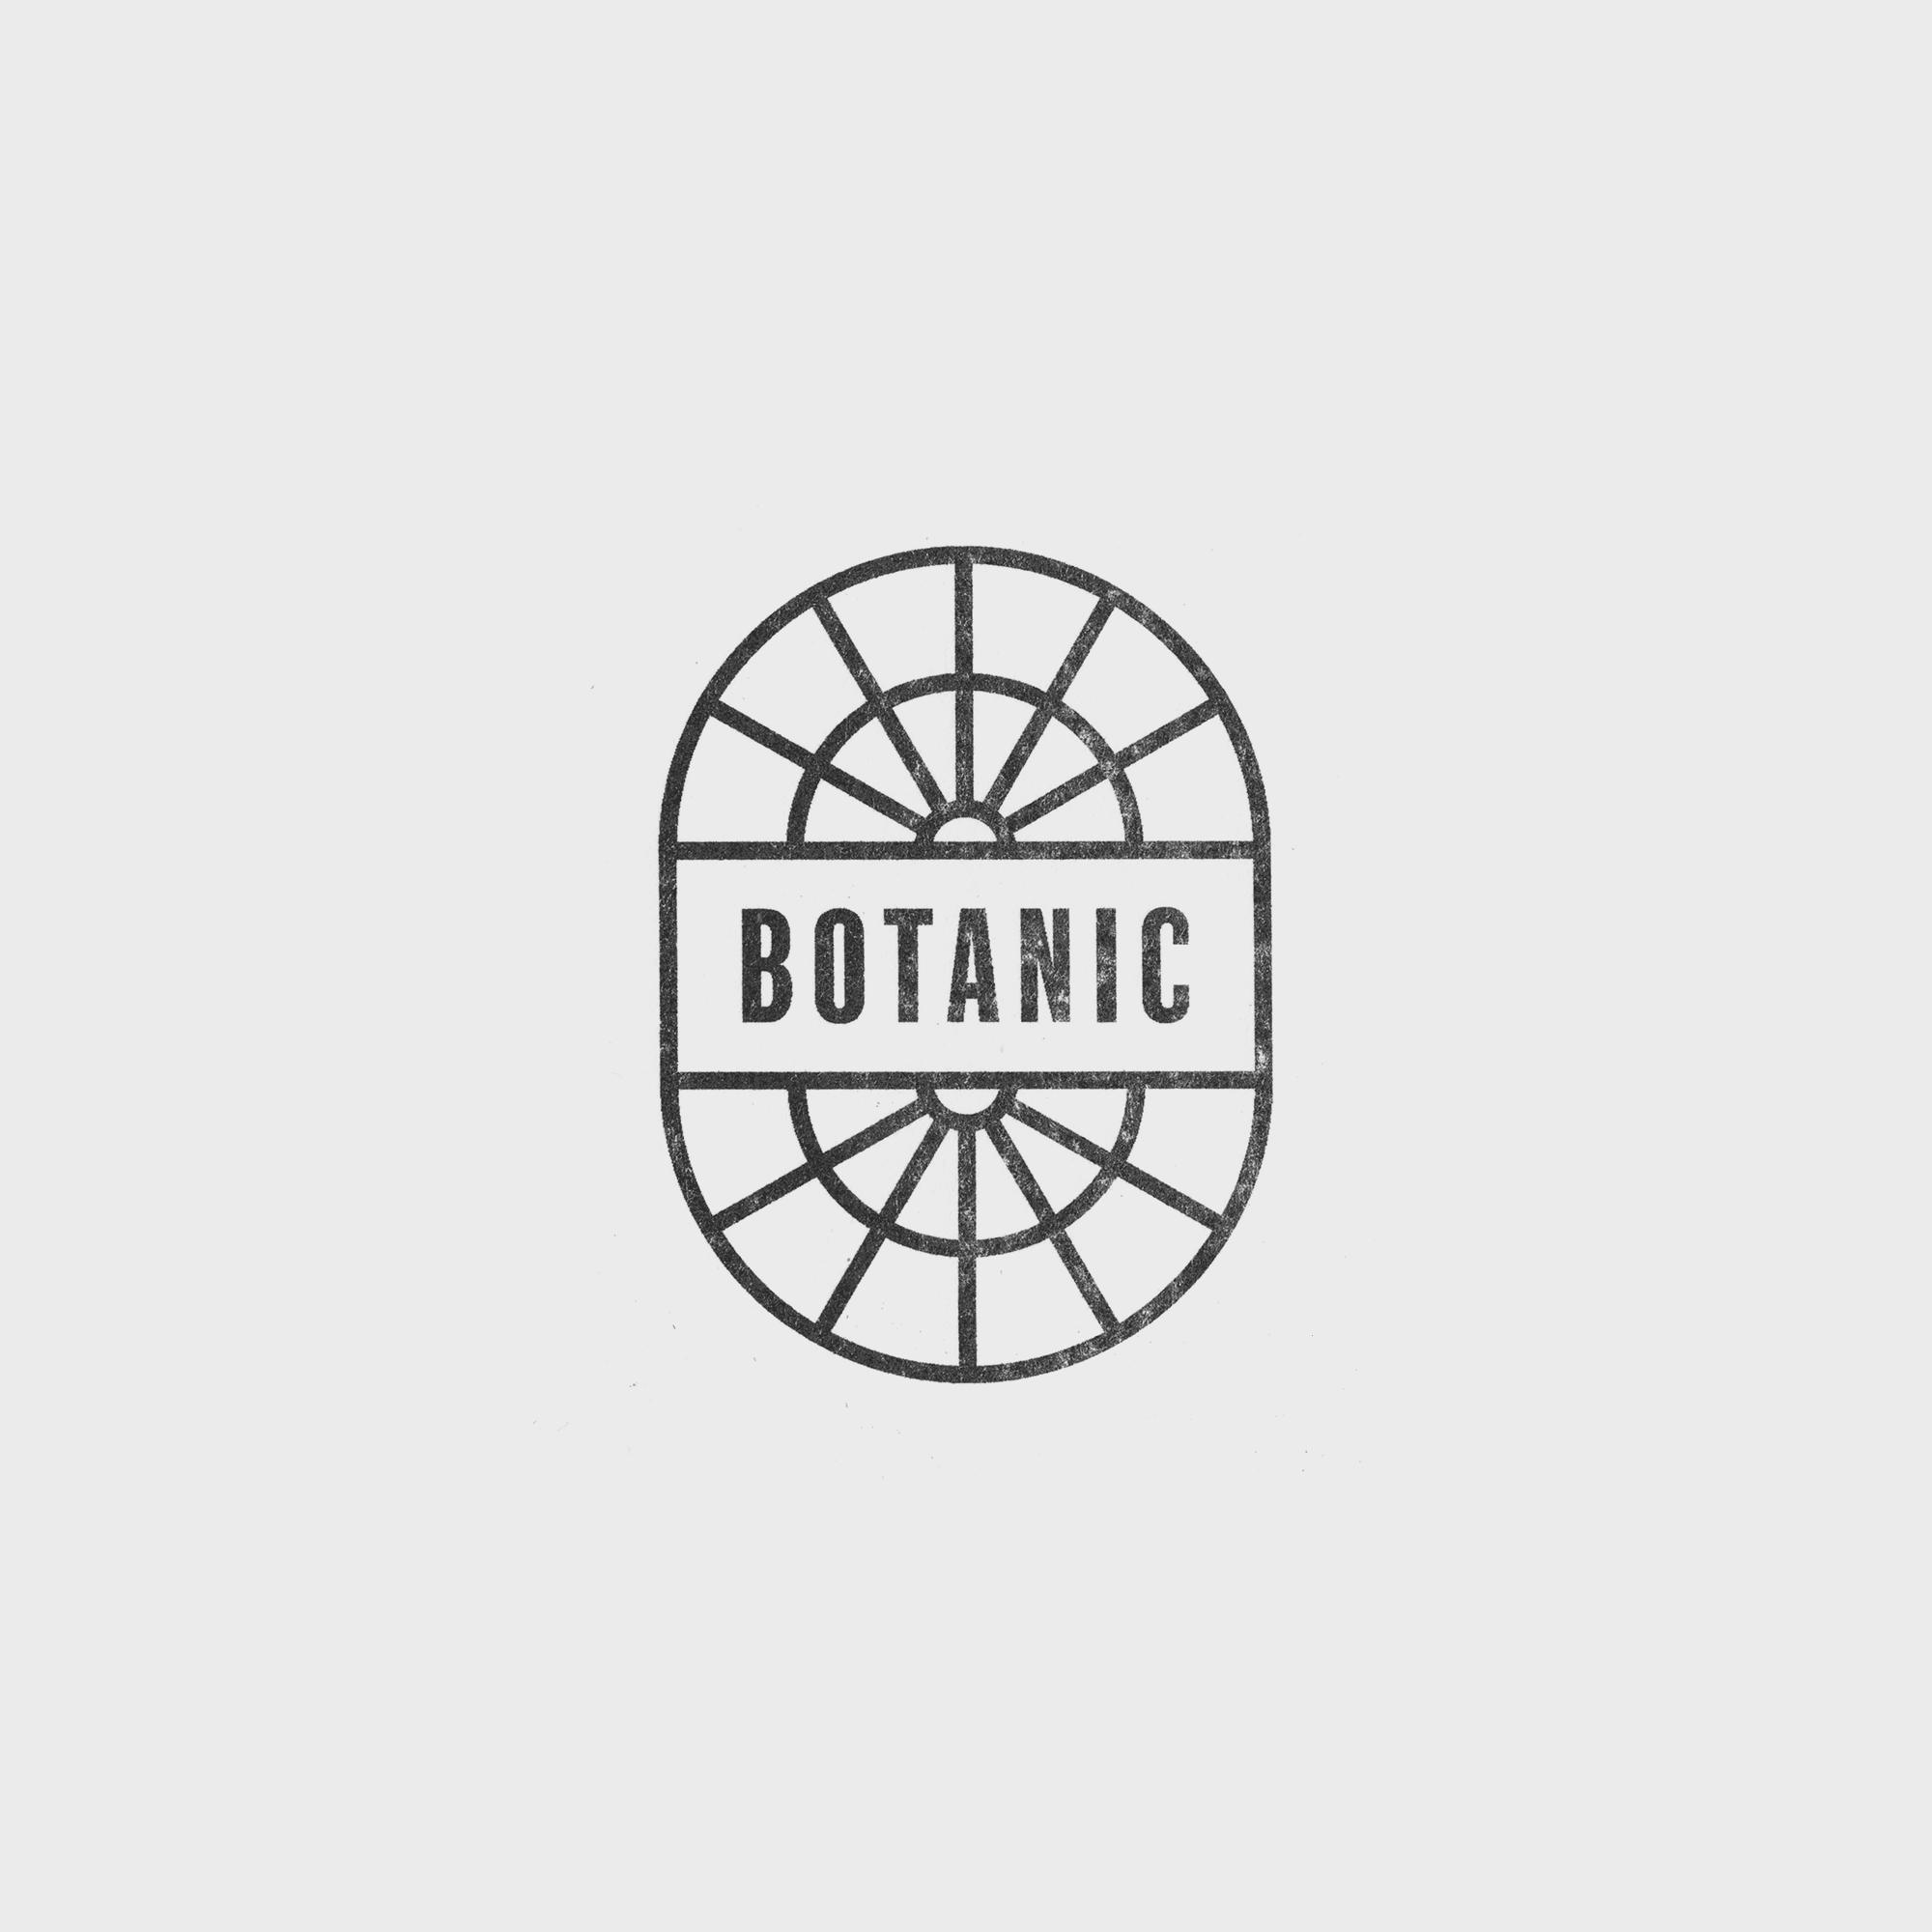 Superkolor_Work_Music_And_Print_Botanic_02